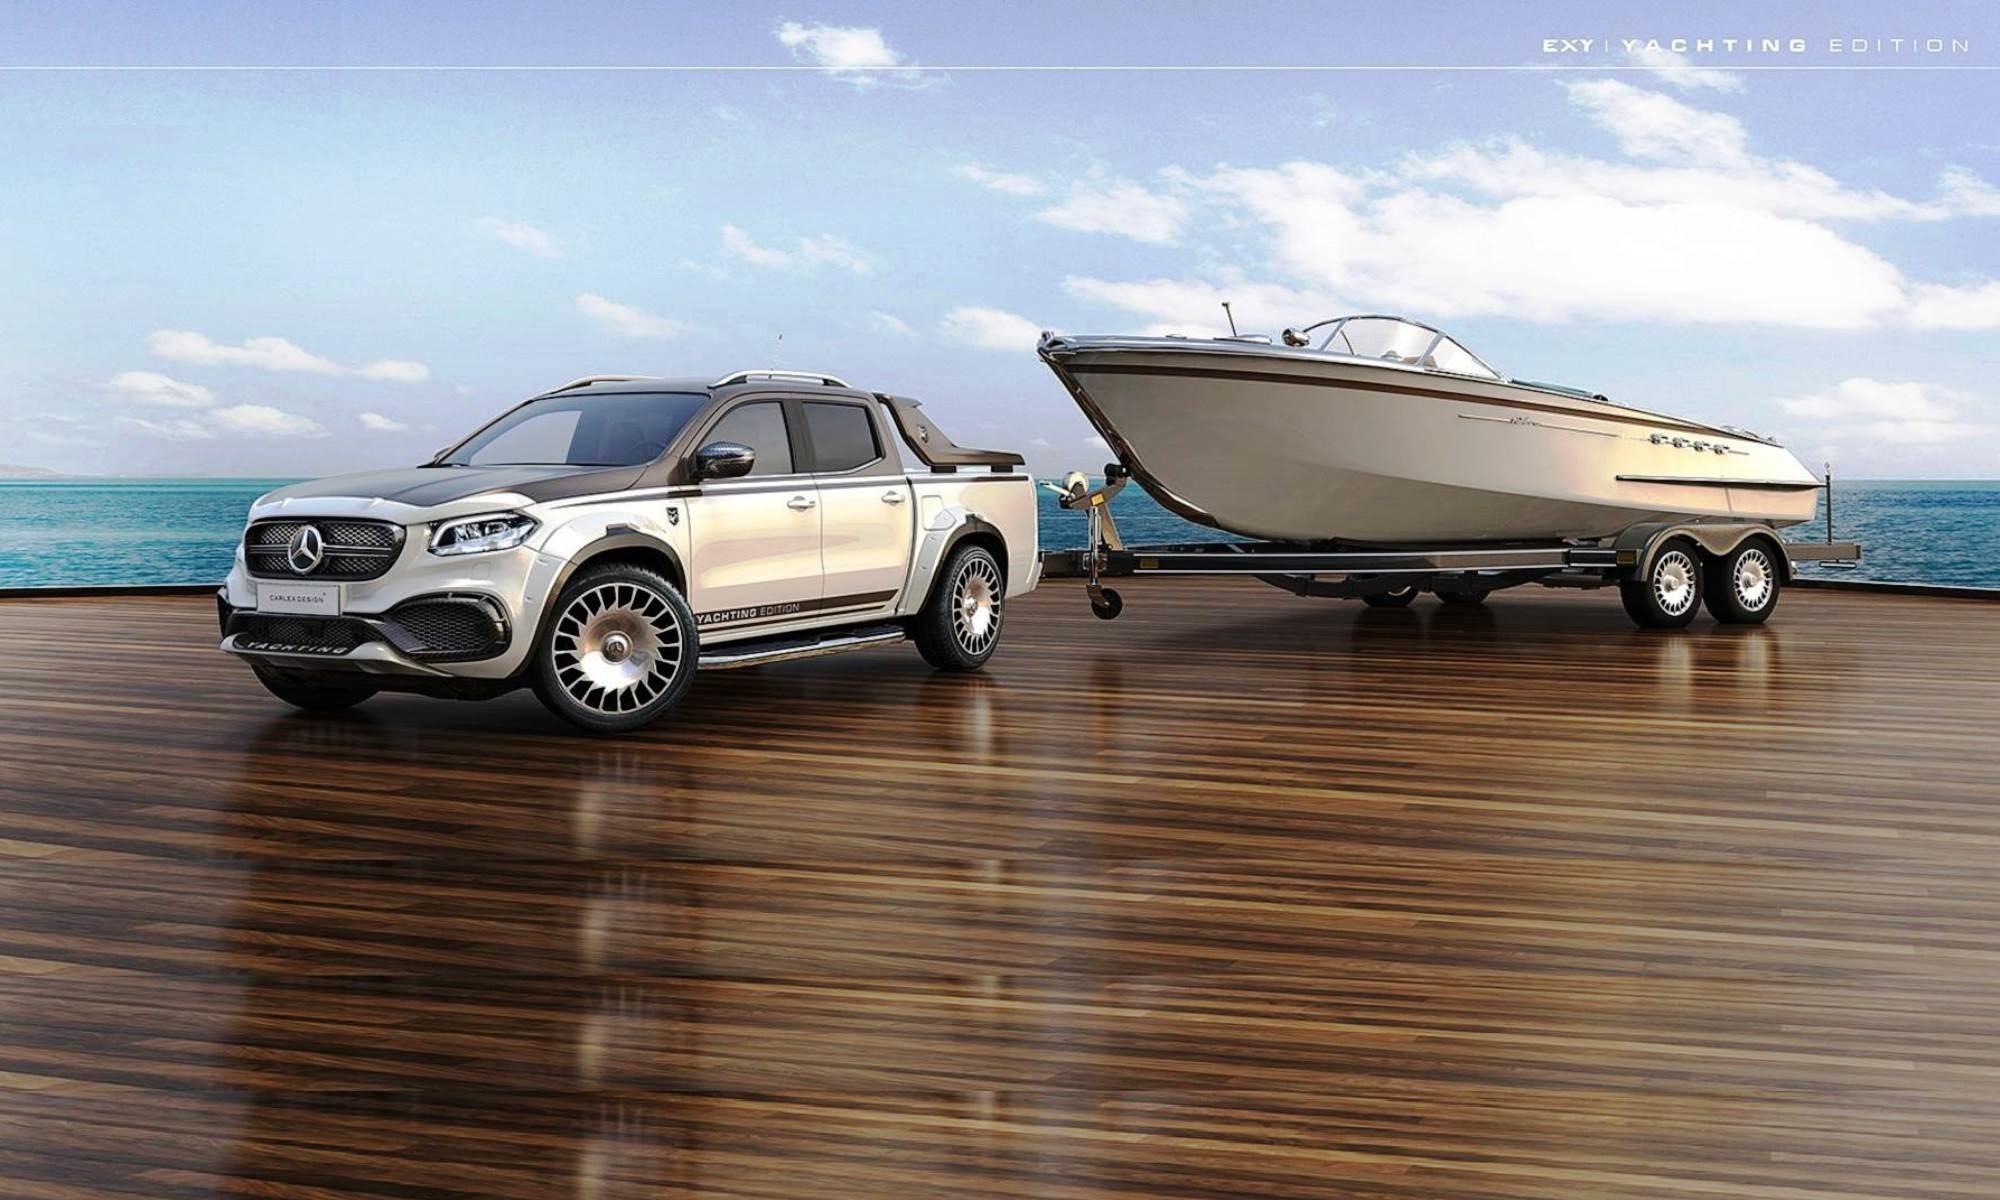 Mercedes-Benz X-Class Carlex Yachting Edition